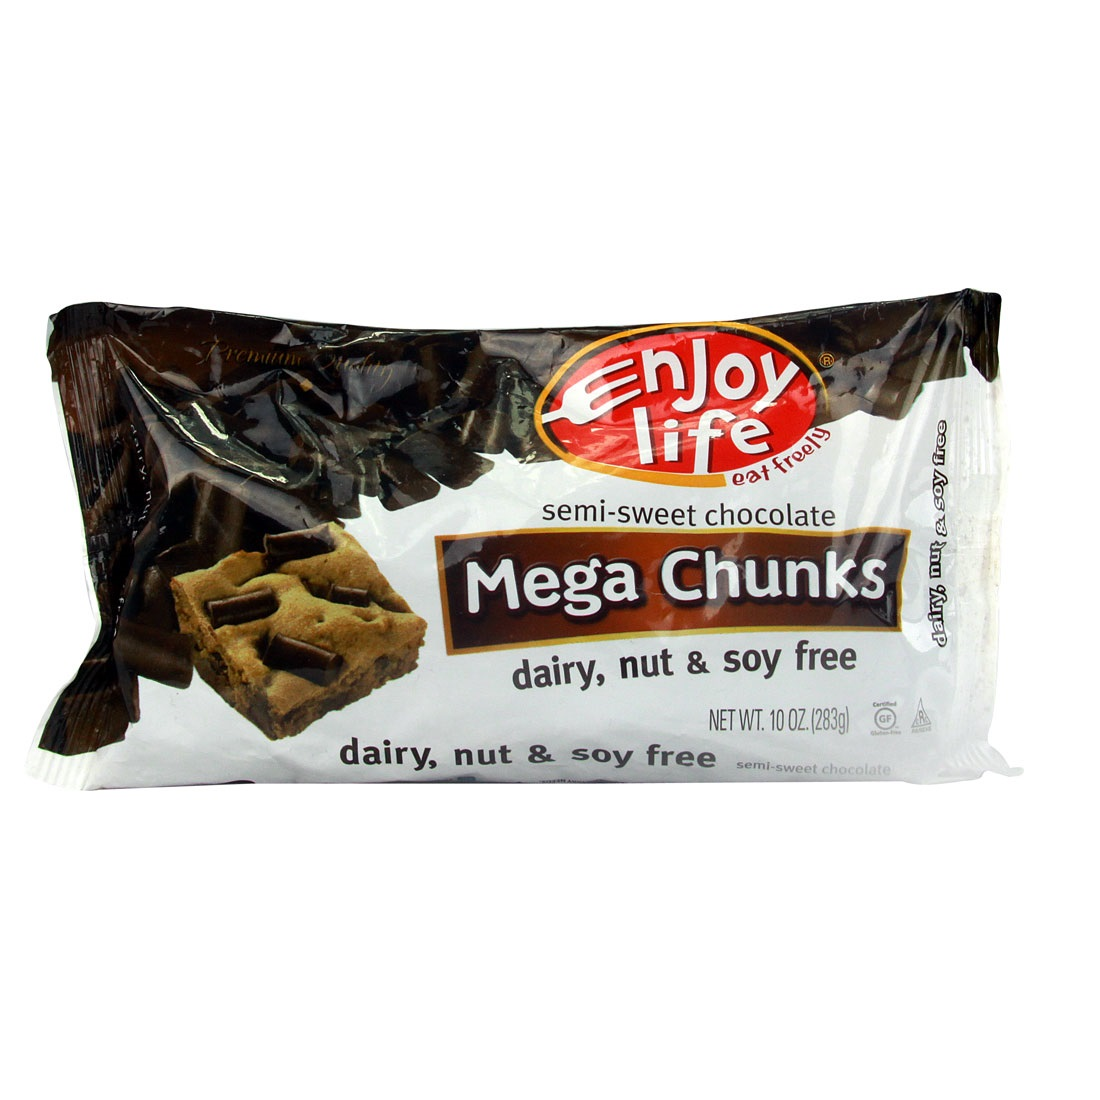 Enjoy Life, Baking Chips, Powder & Bars, Choc Chunk Semi Swt Mega, 10 Oz (Pack Of 12) by Enjoy Life Natural Brands